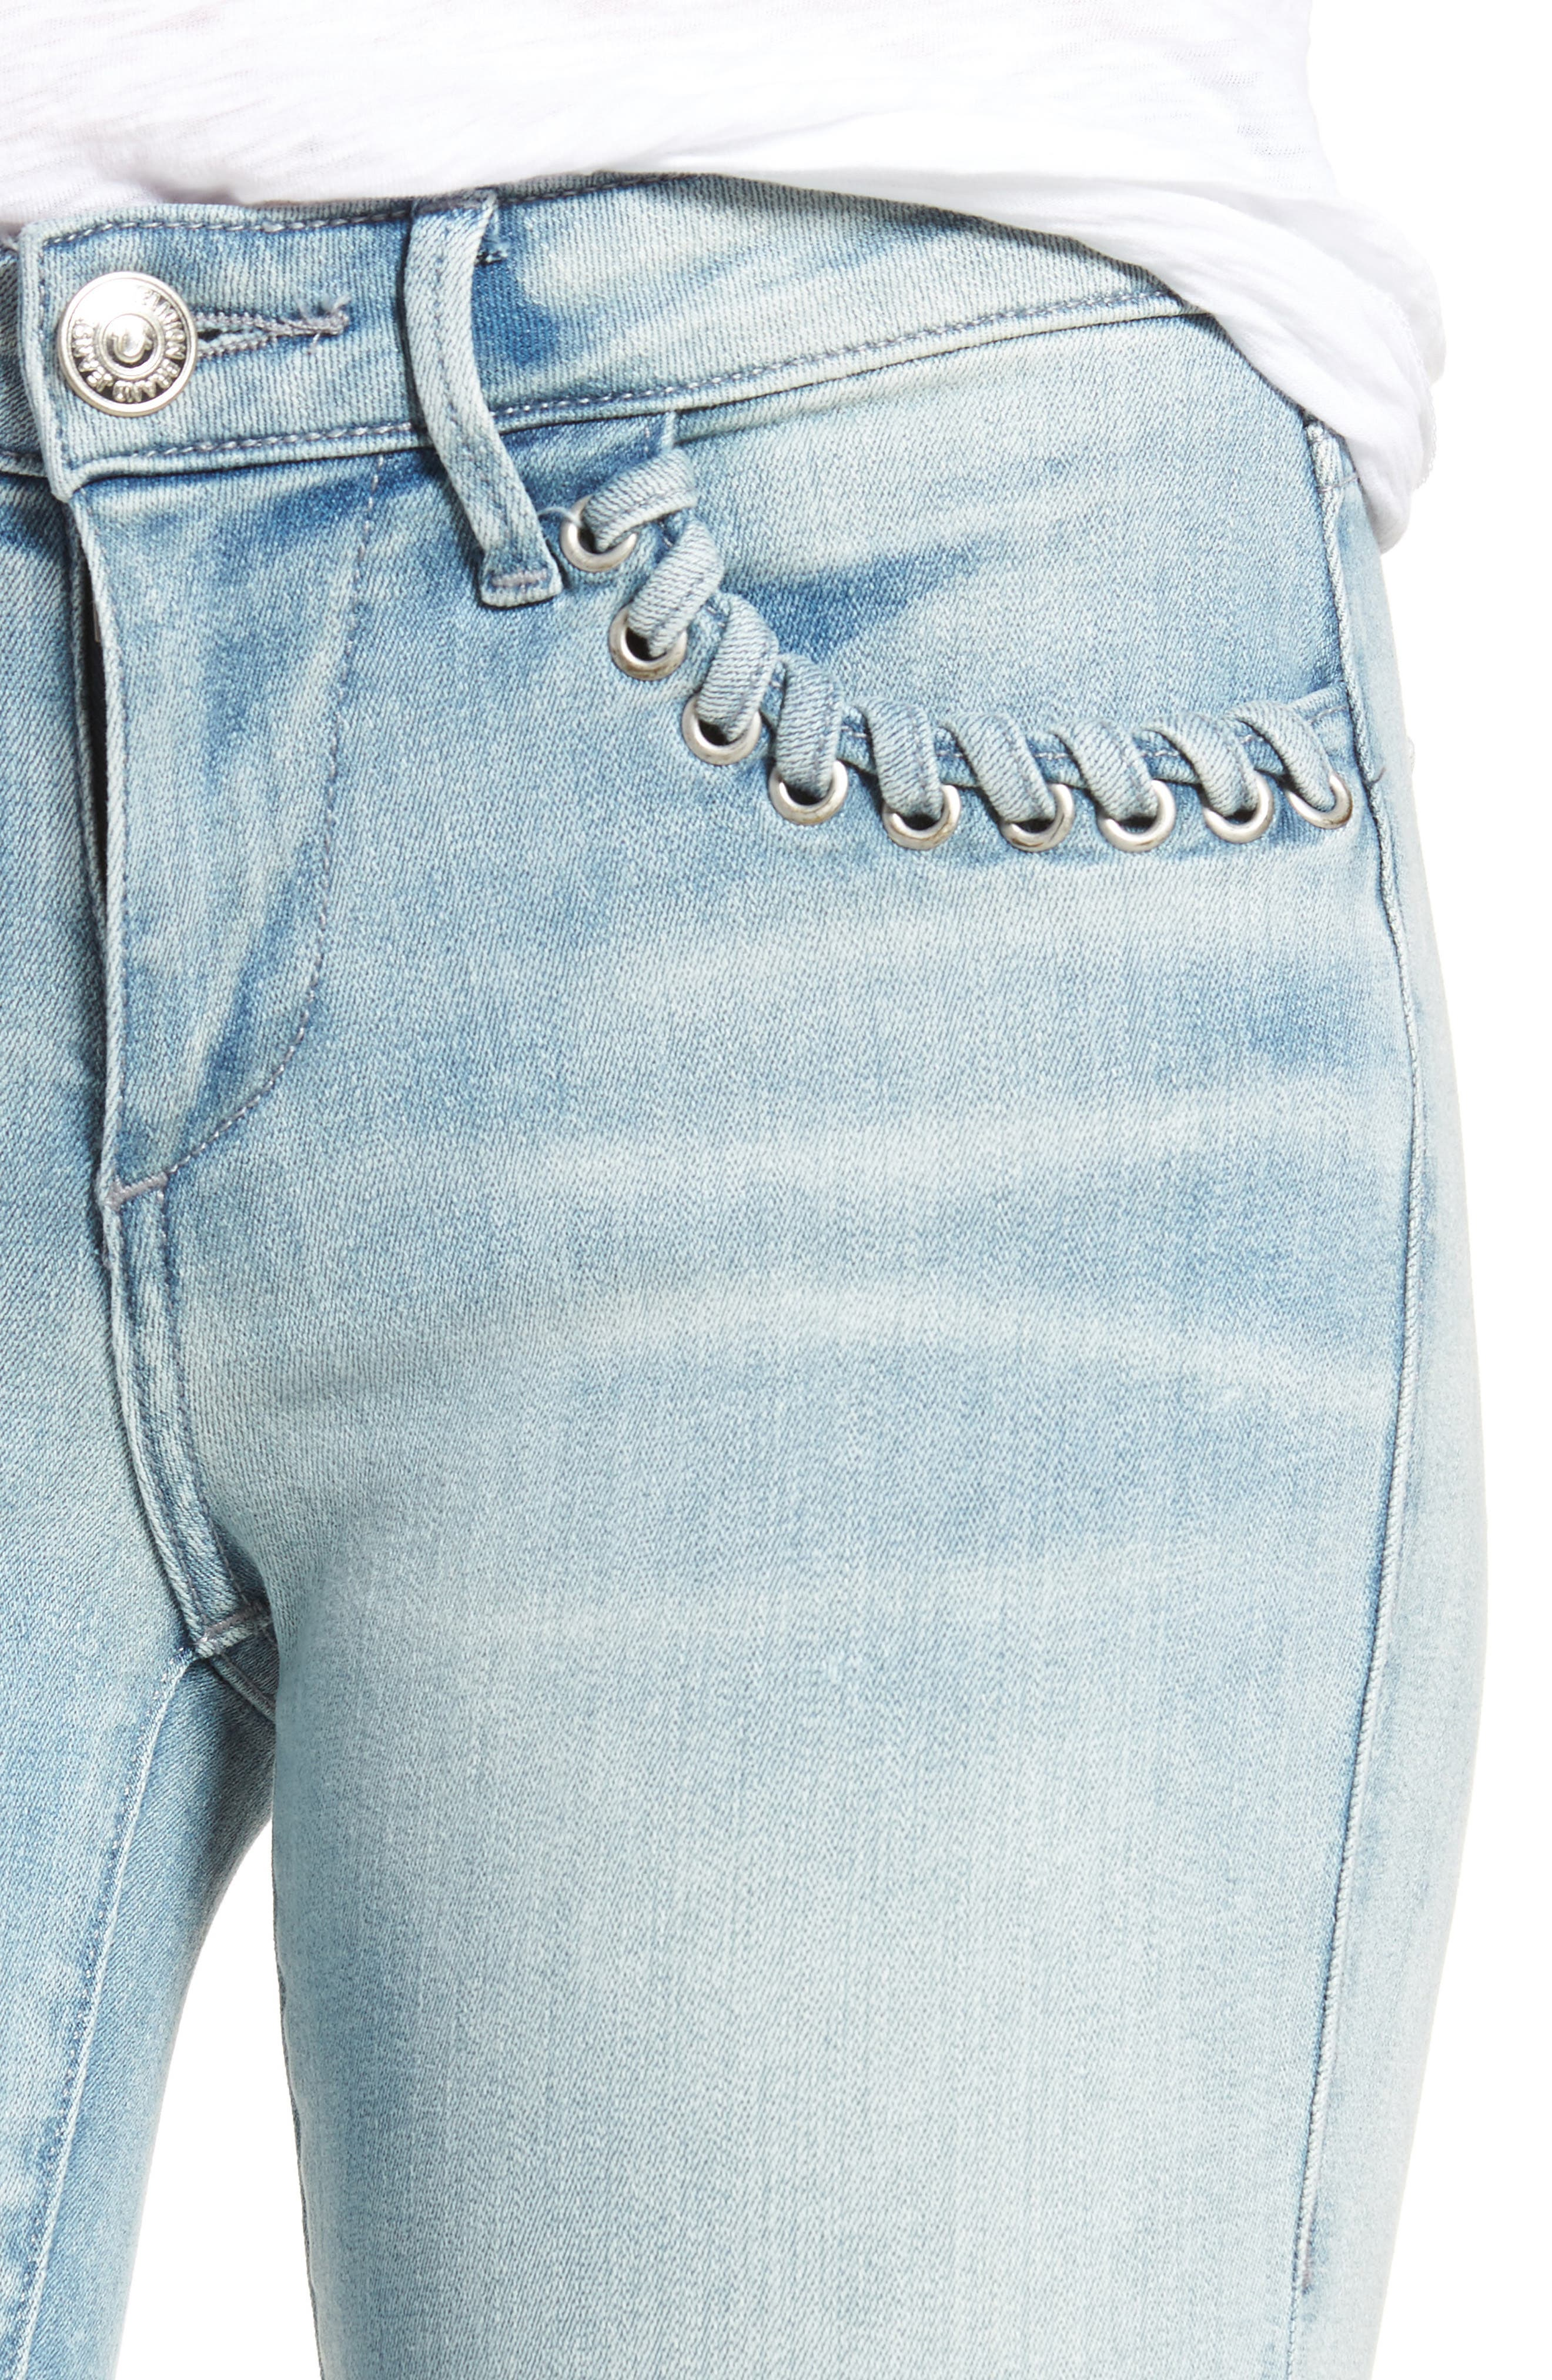 Halle Super Skinny Jeans,                             Alternate thumbnail 5, color,                             Cloud Nine